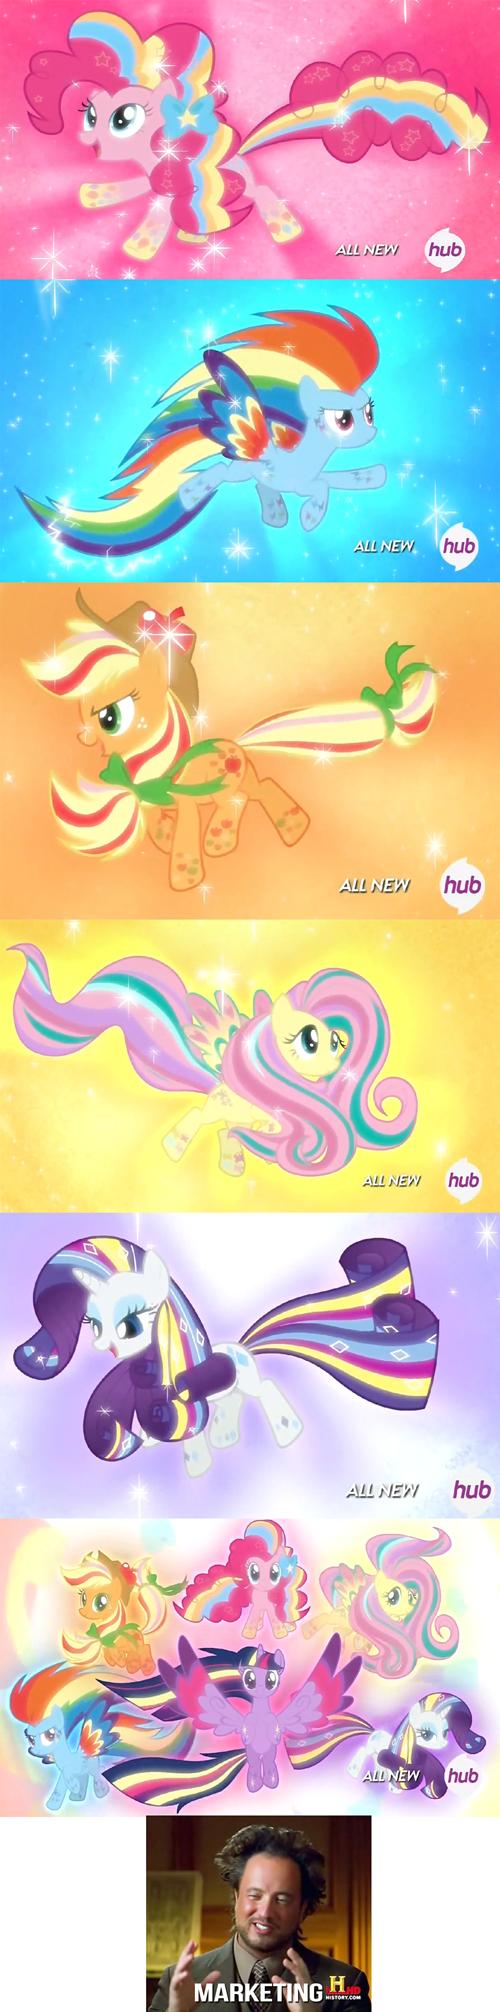 Hasbro mane 6 rainbow power - 8182413312